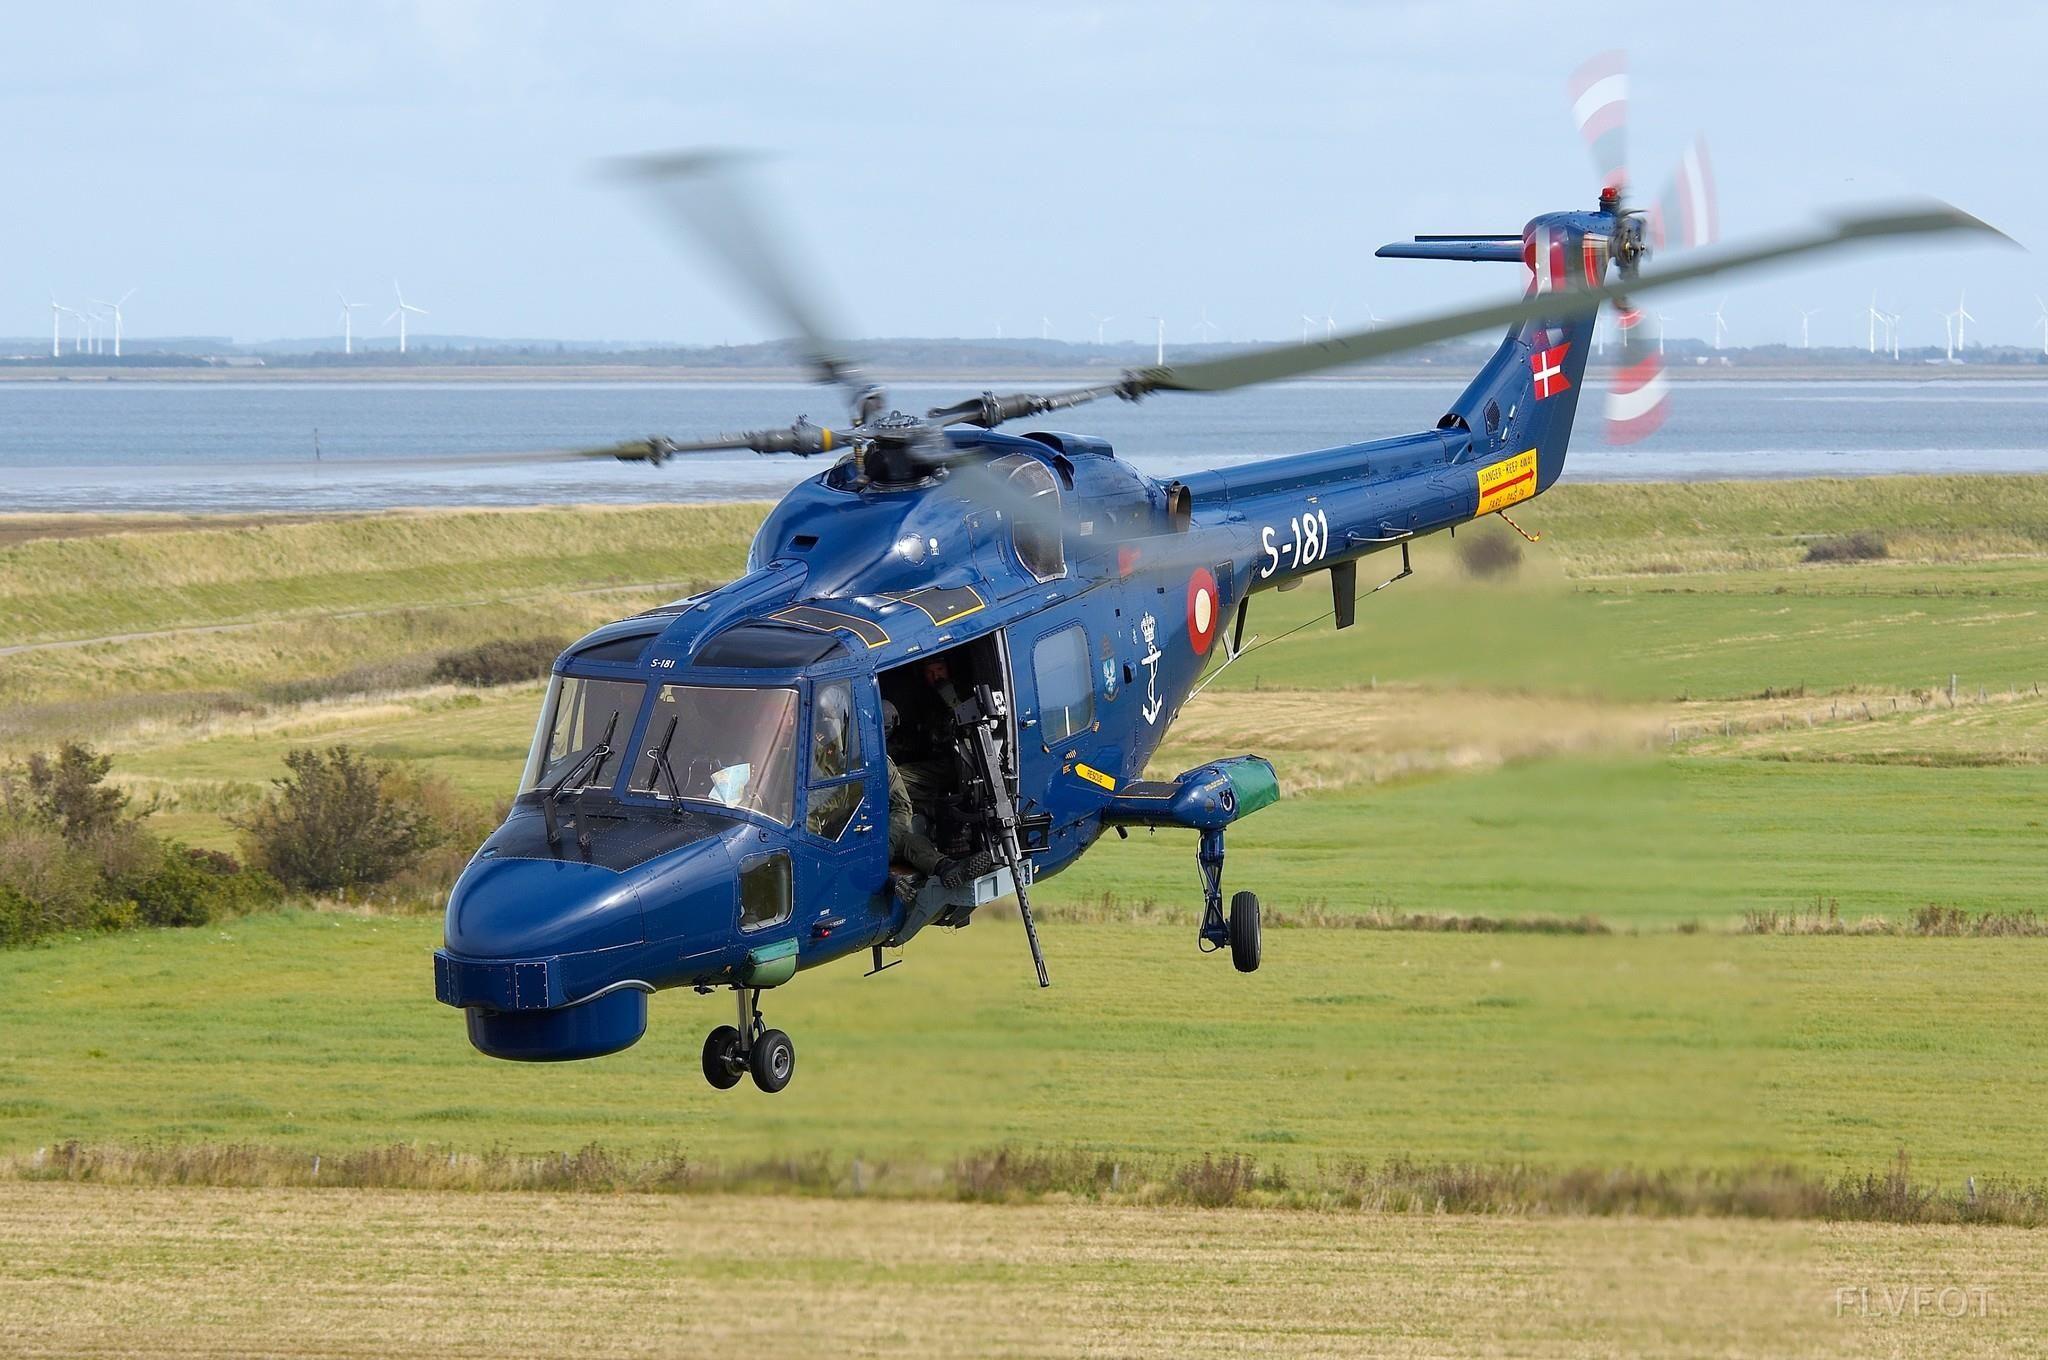 TMG (tung maskingevær) skydning fra Lynx Helikopter på Rømø. Flyvevåbnets Fototjeneste